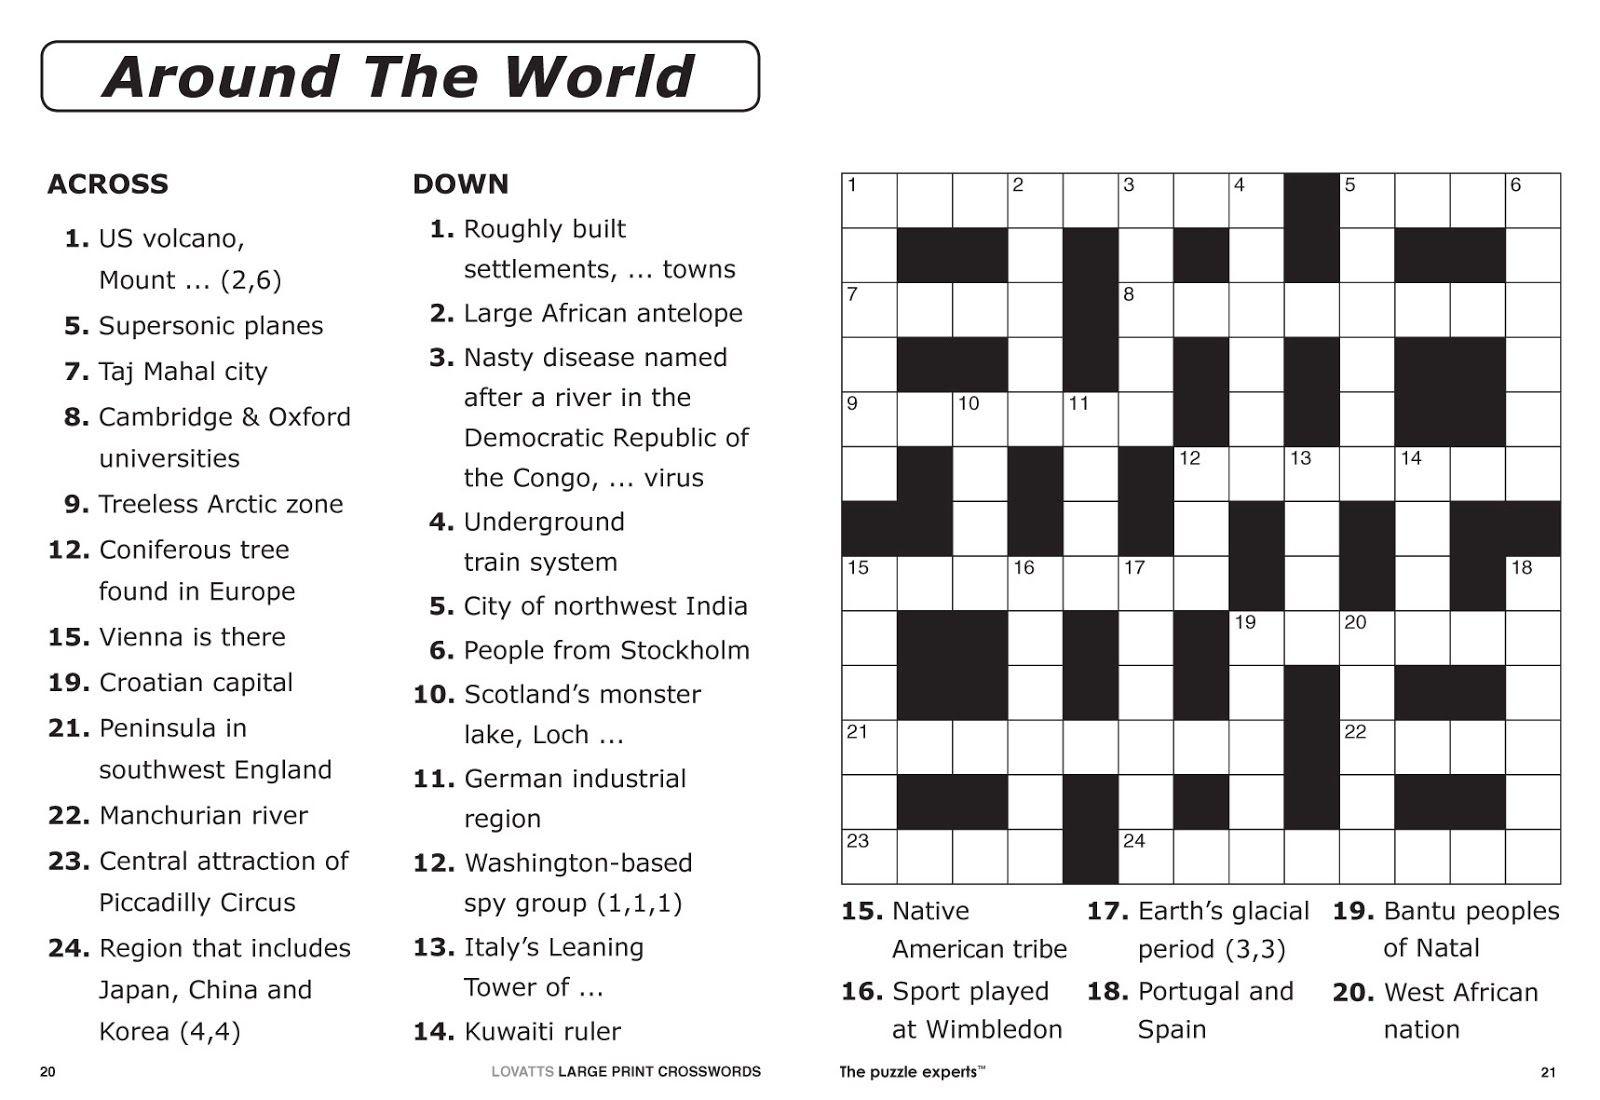 Easy Printable Crossword Puzzles | Elder Care & Dementia Care - Free - Make Your Own Printable Crossword Puzzles